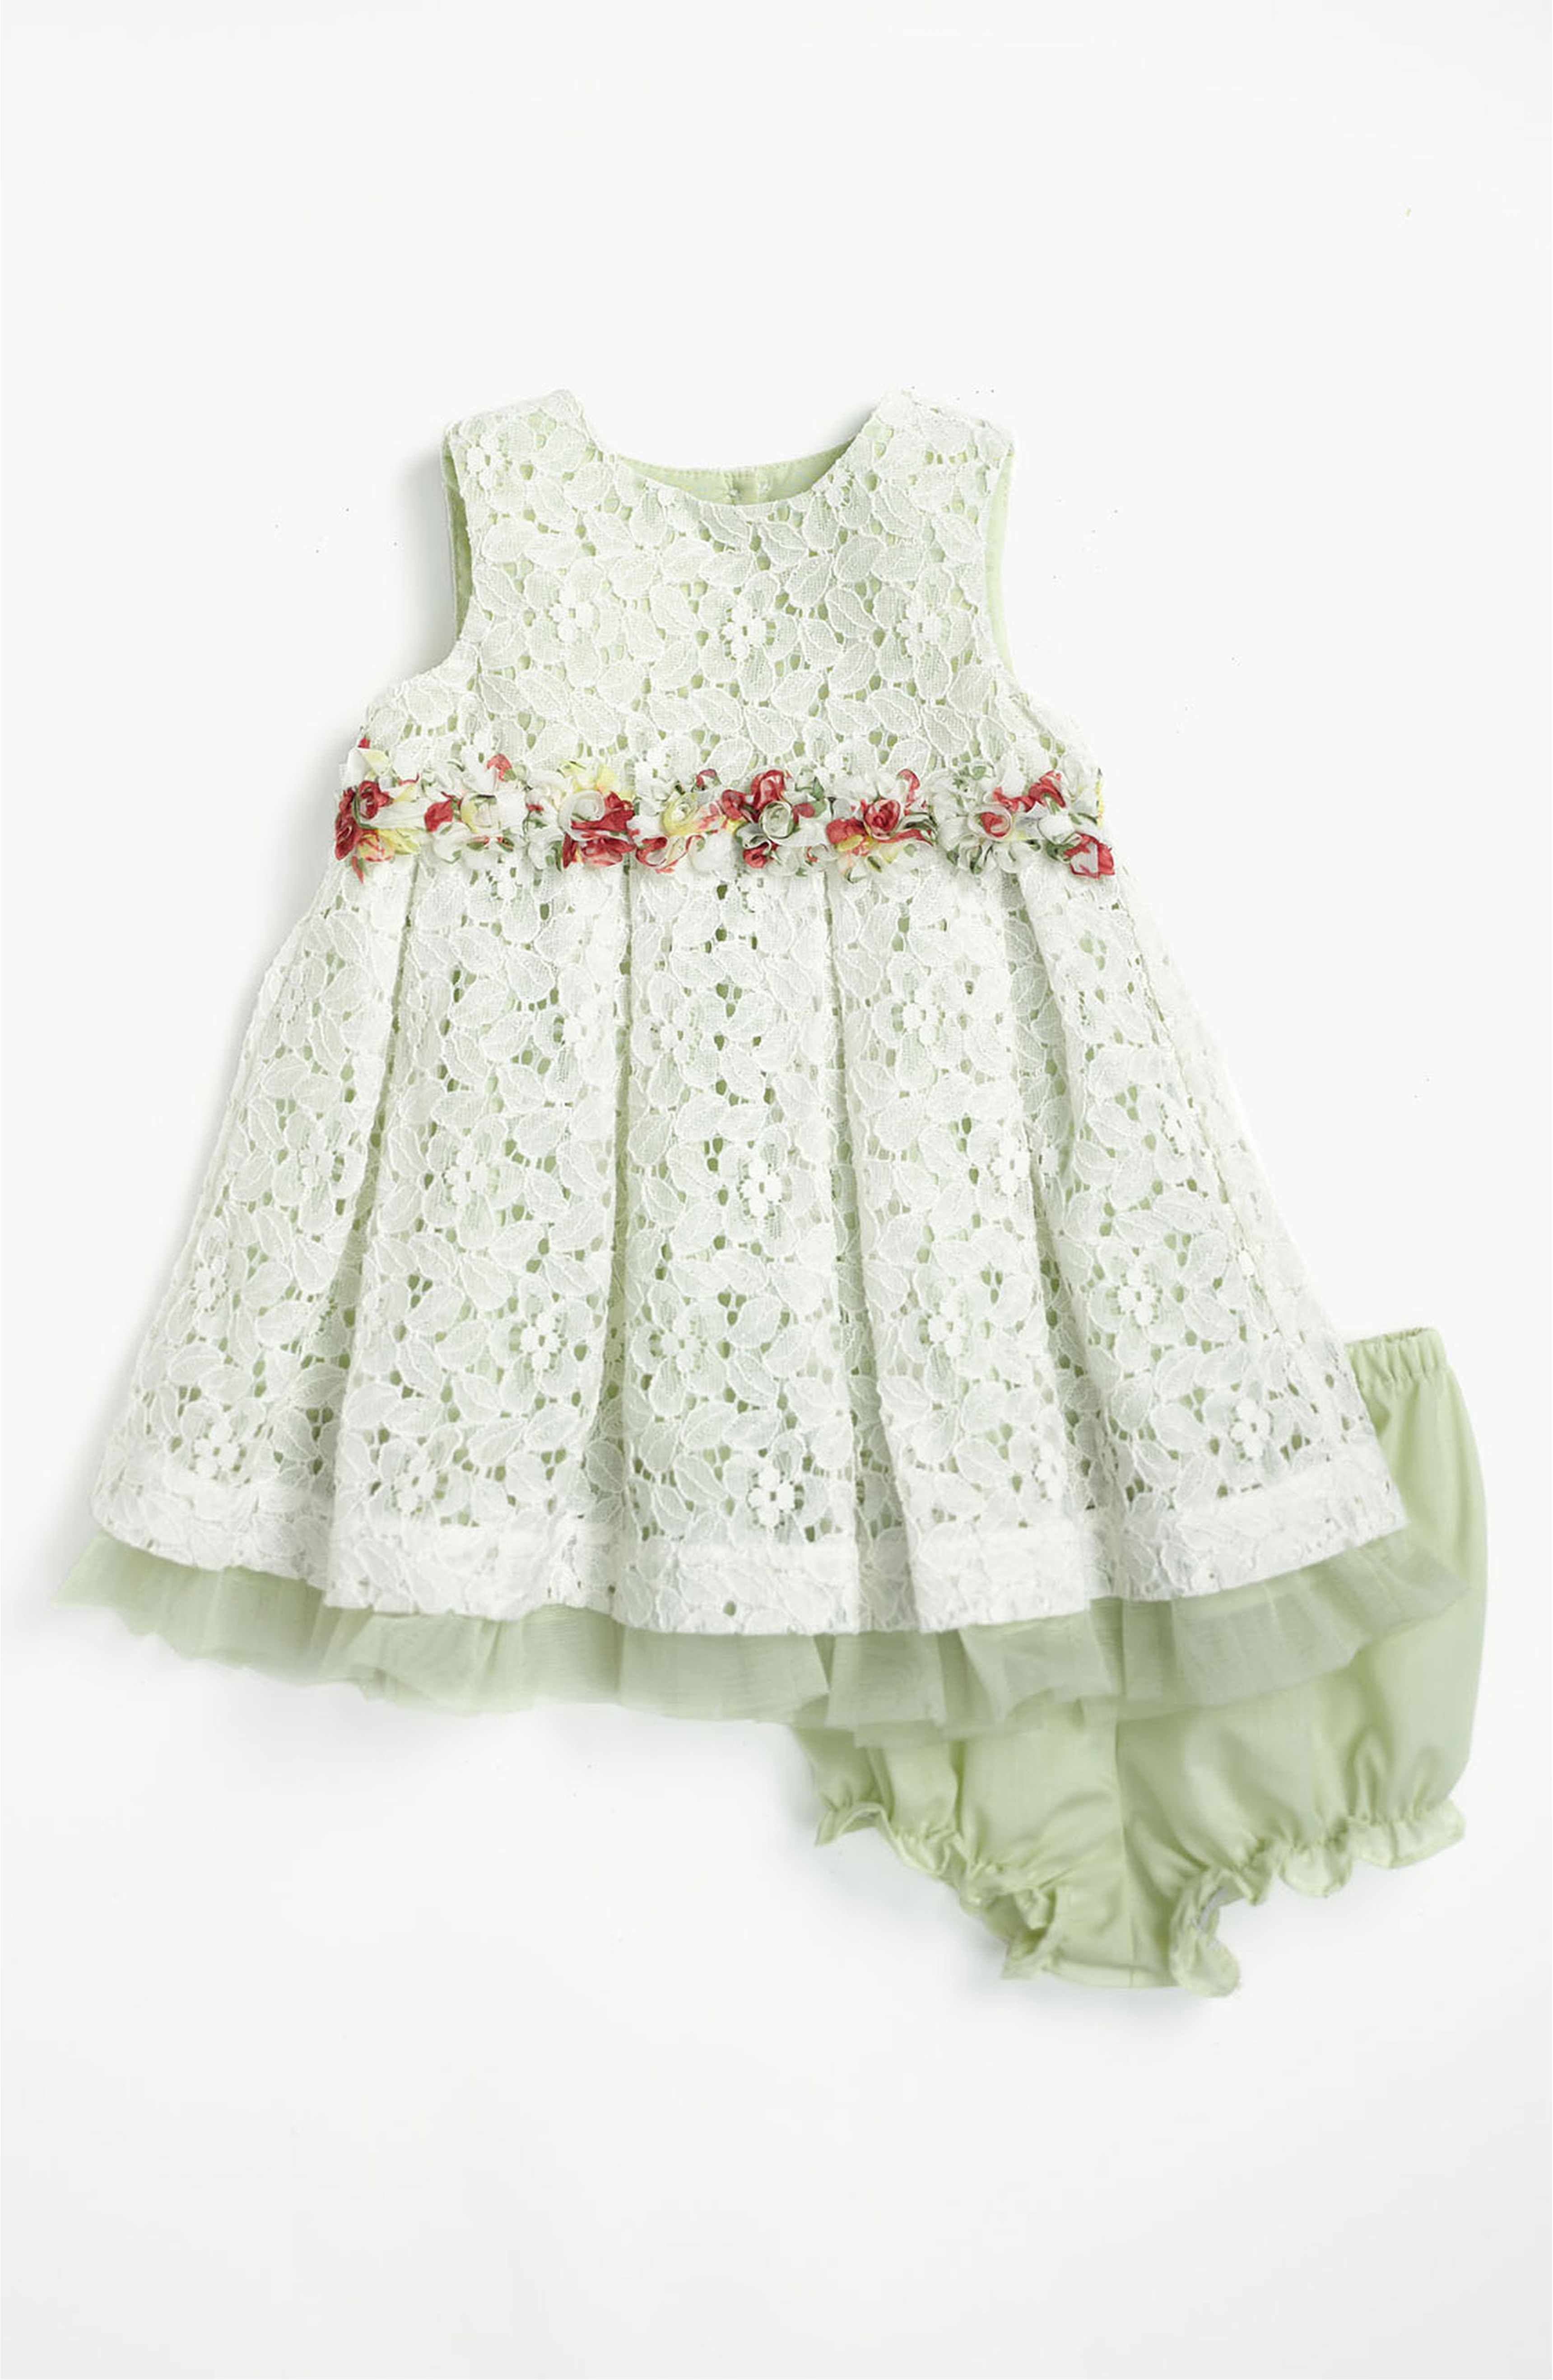 Main Image Pippa & Julie Lace Dress & Bloomers Baby Girls